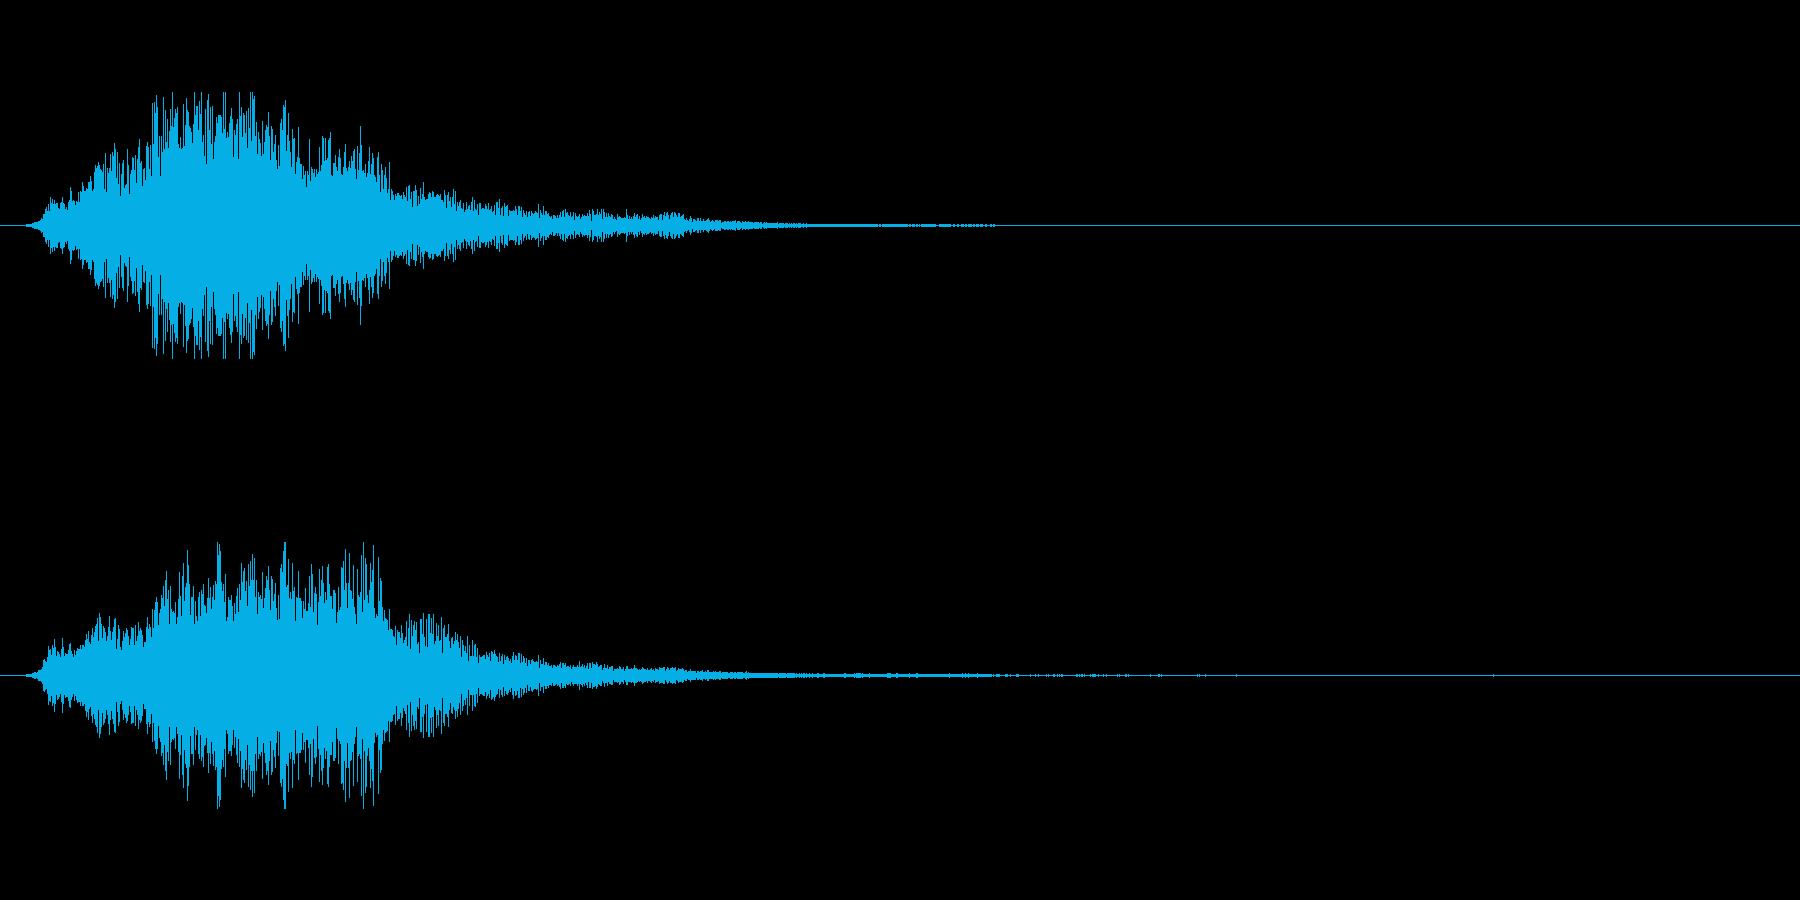 SFの瞬間移動などにの再生済みの波形